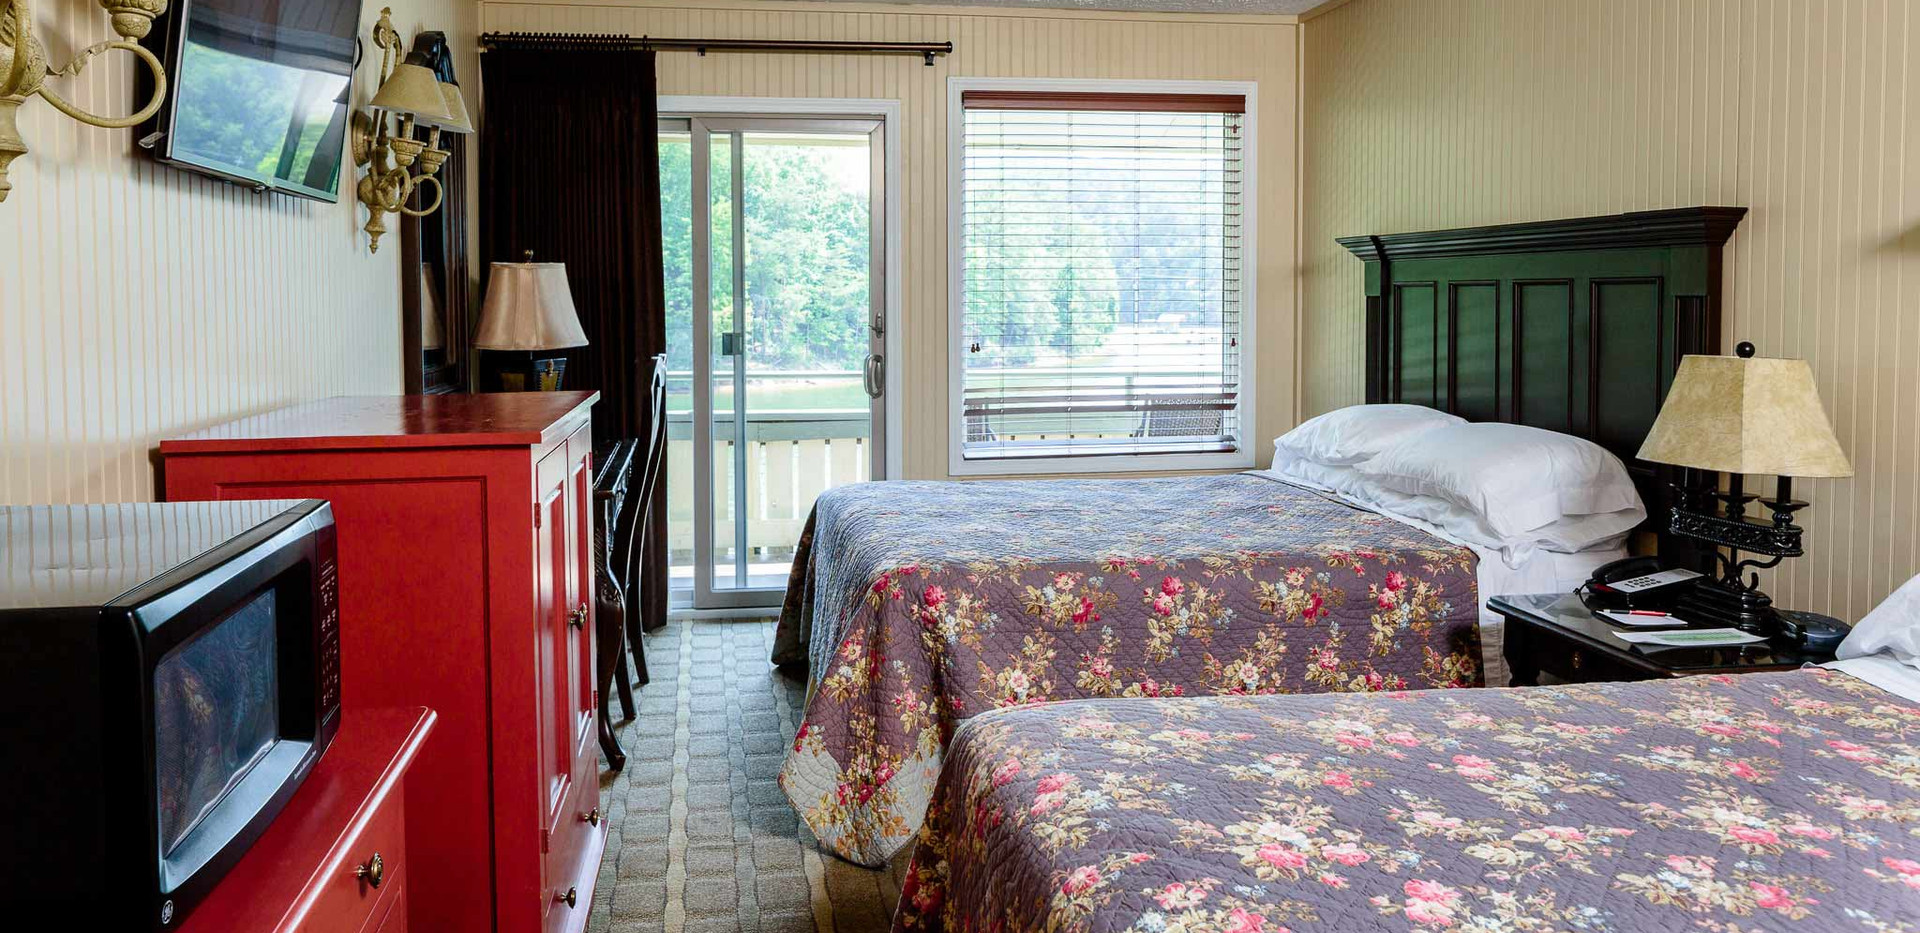 Motel-Room Double Queen -Enchanted DIY RE-TREAT 2020